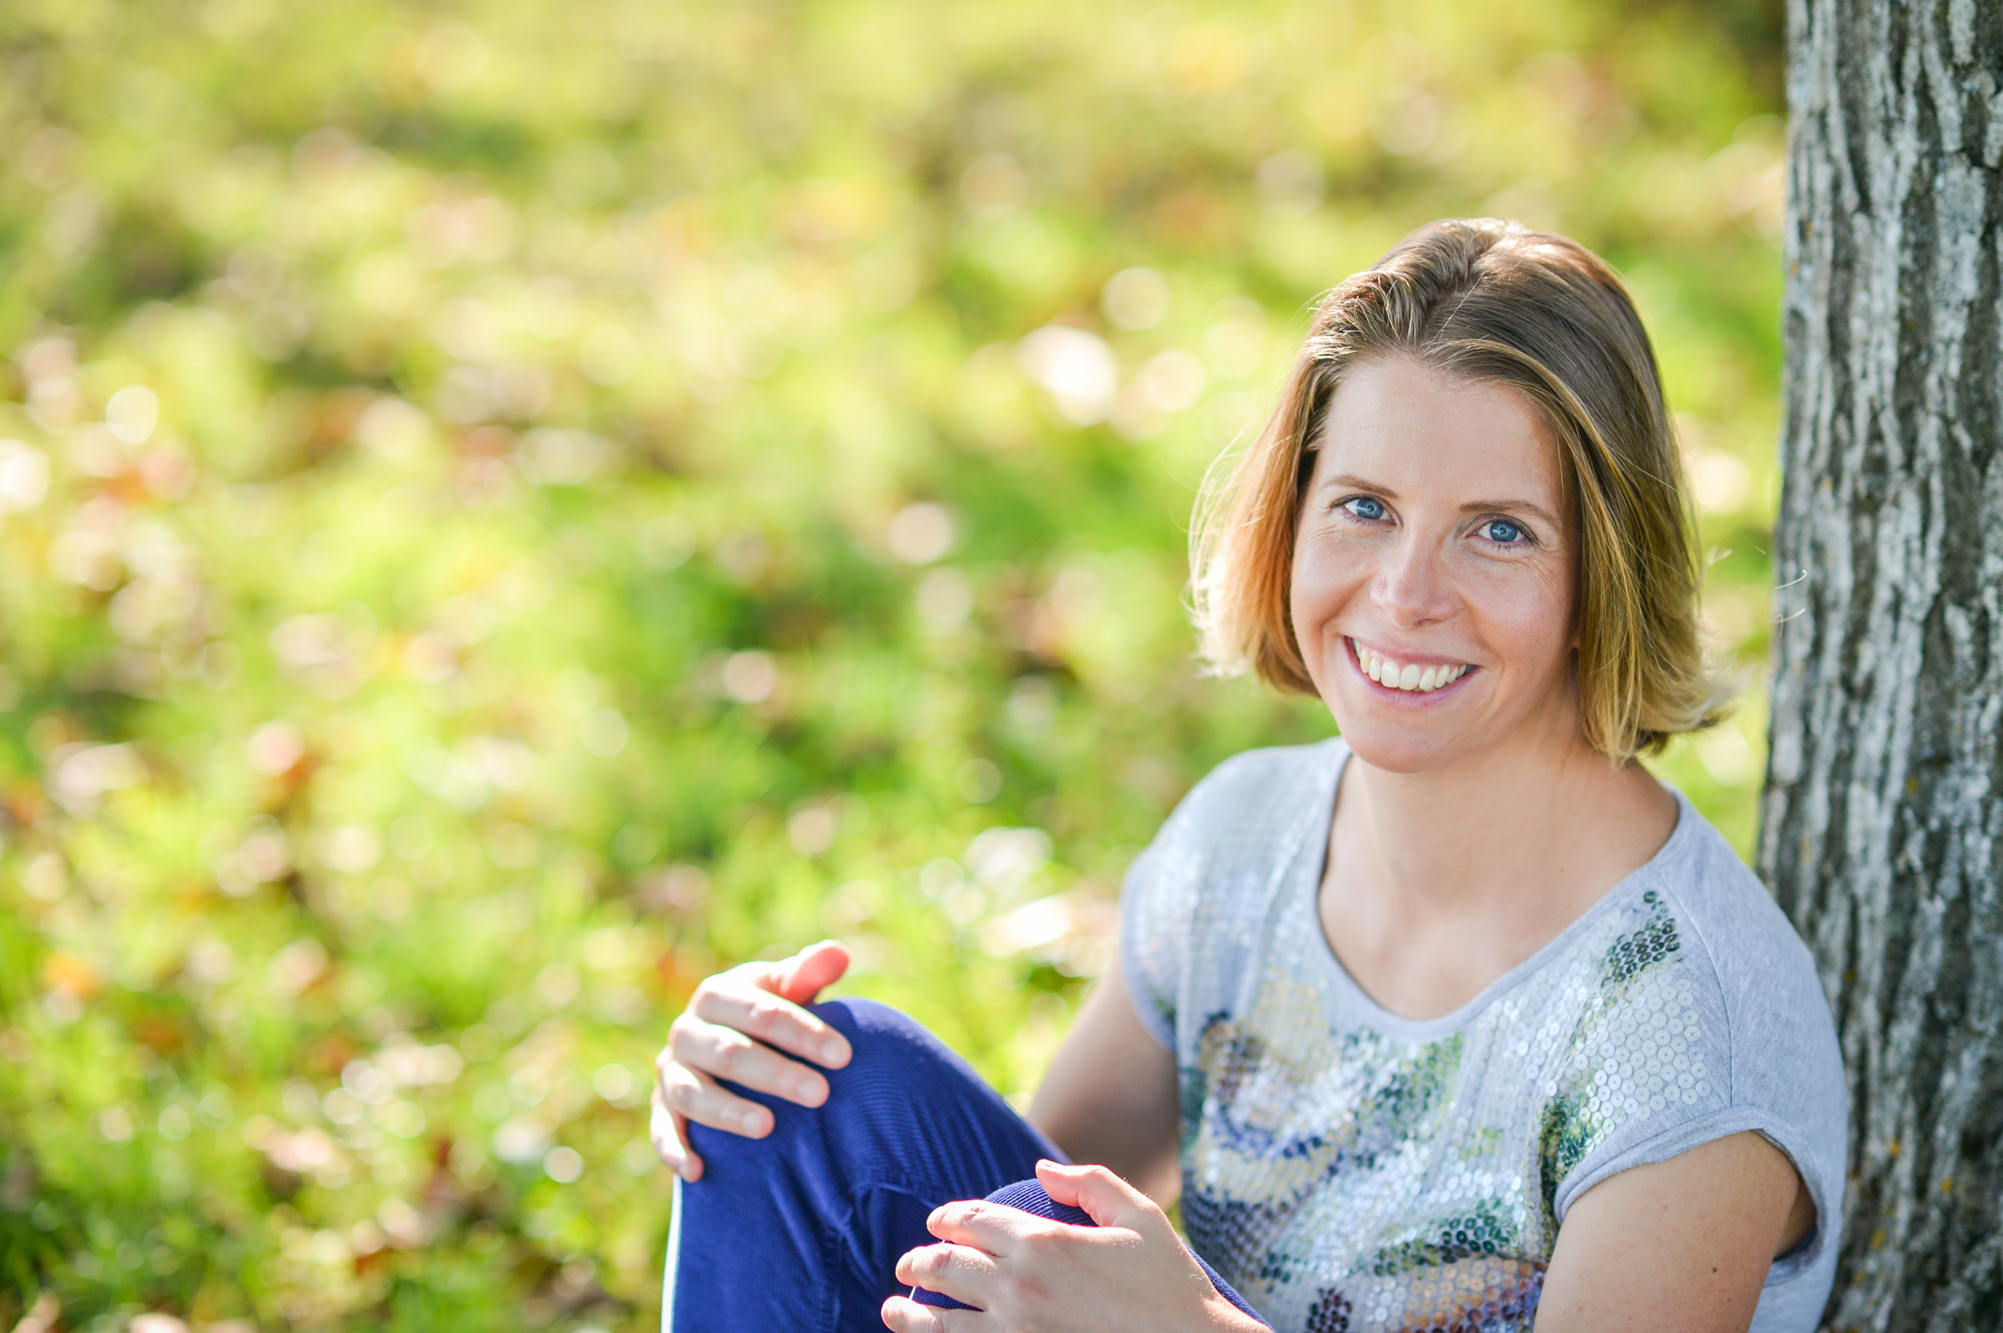 Seelenportraits.com-9087.jpg